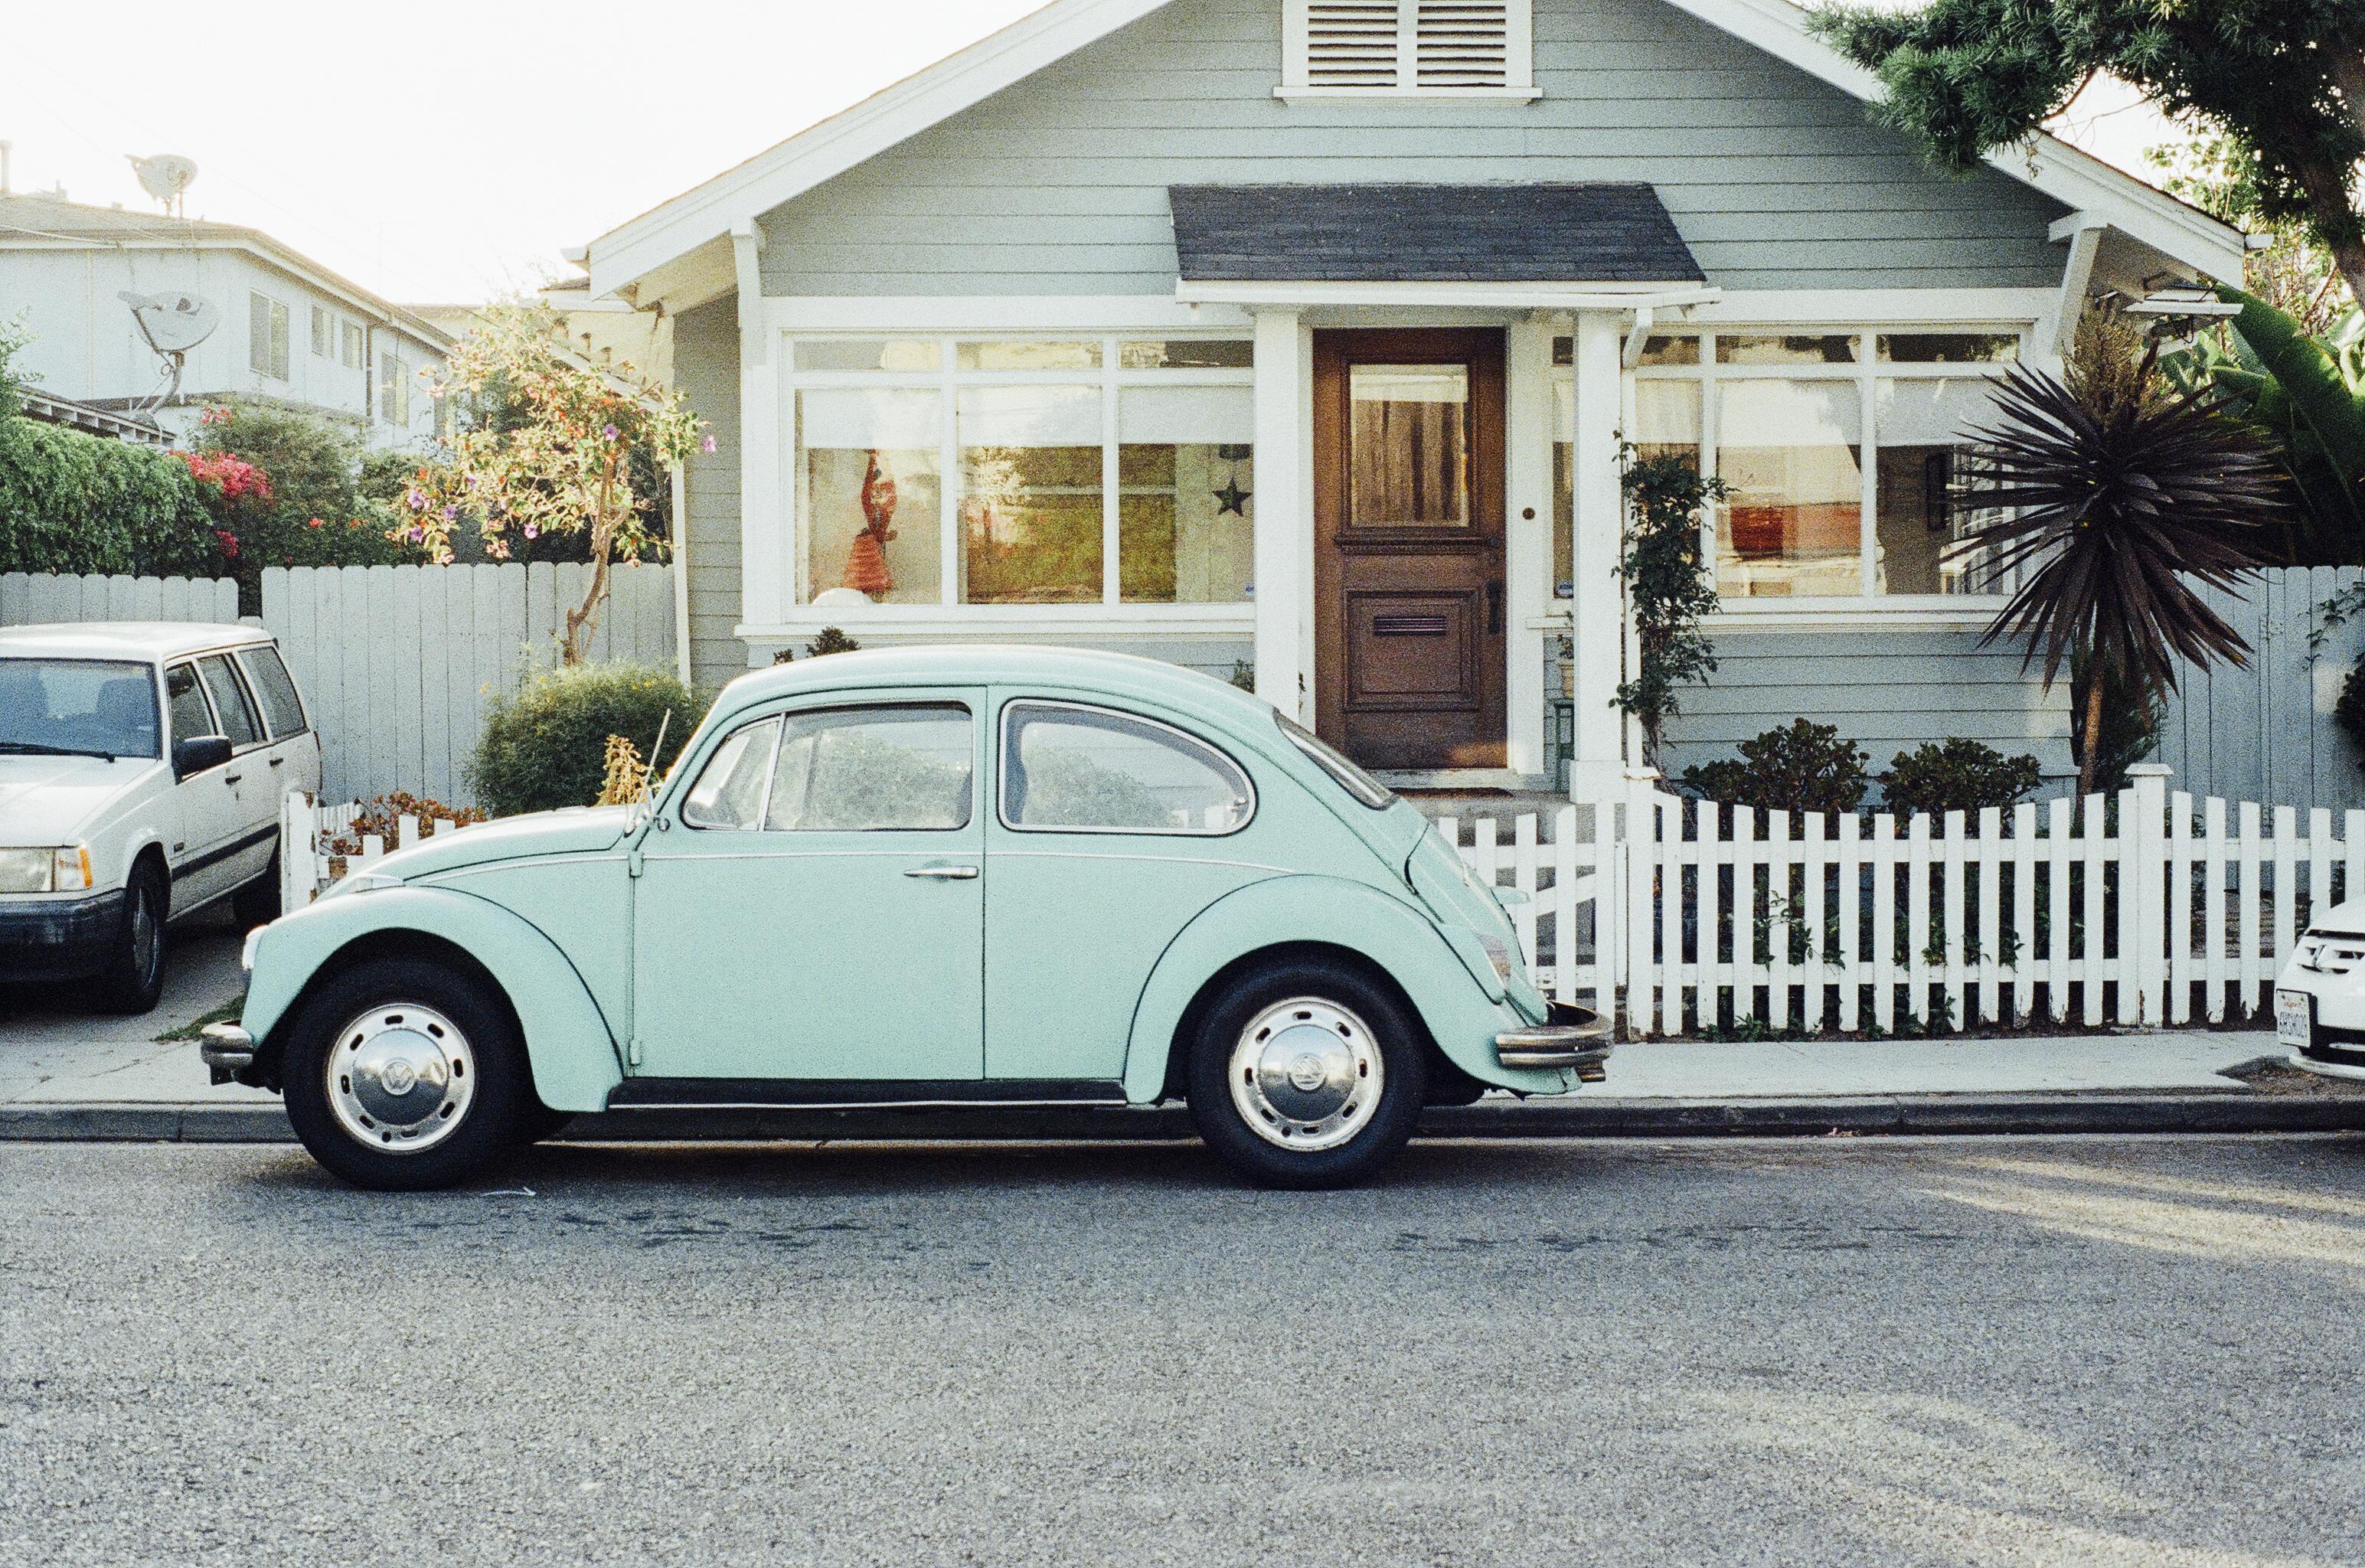 Free Images : wheel, house, vw, old, motor vehicle, vintage car ...